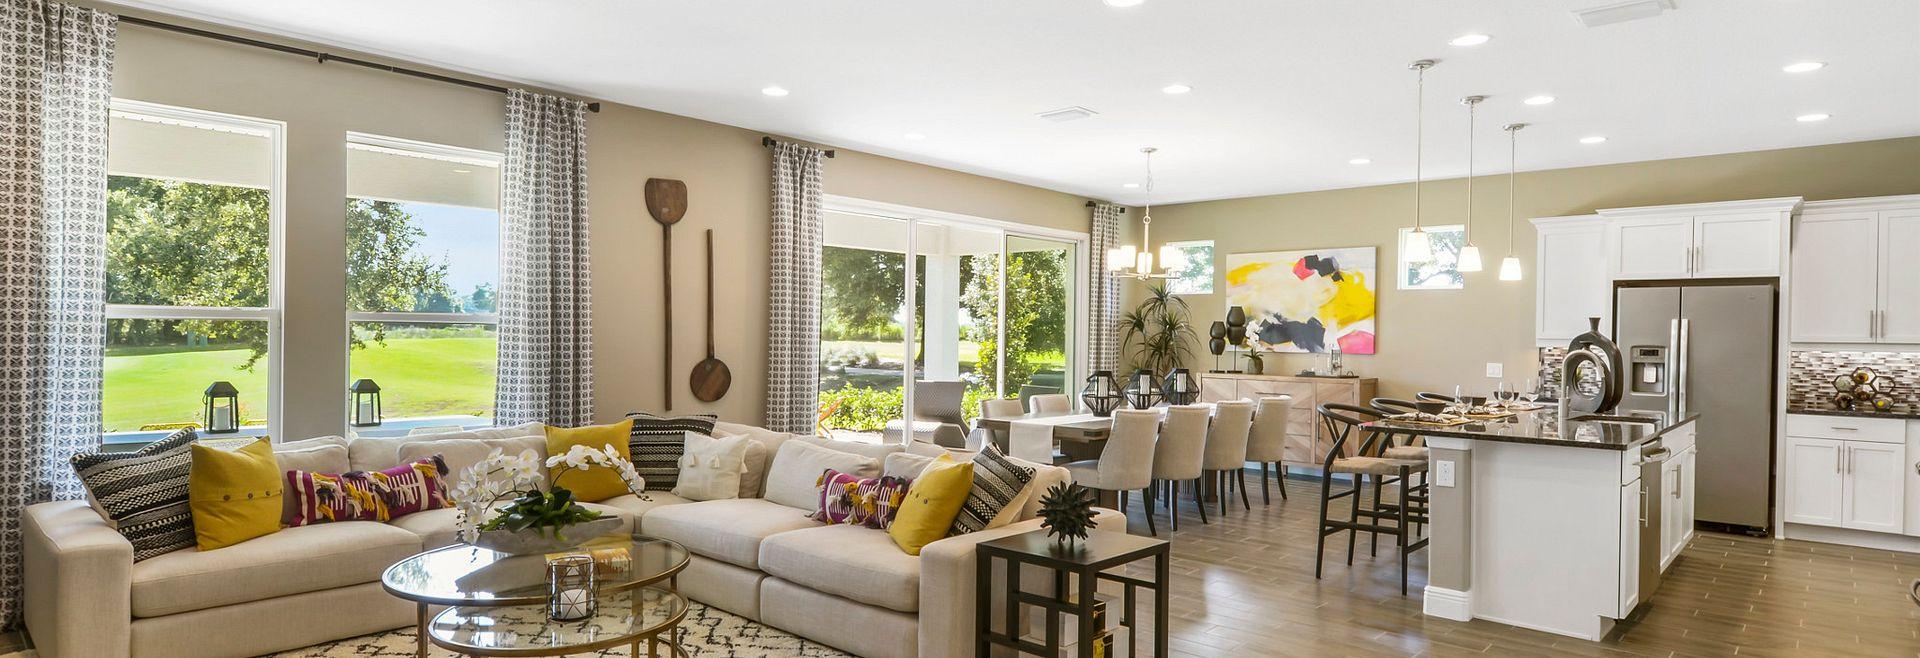 Trilogy at Ocala Preserve Liberty Model Great Room